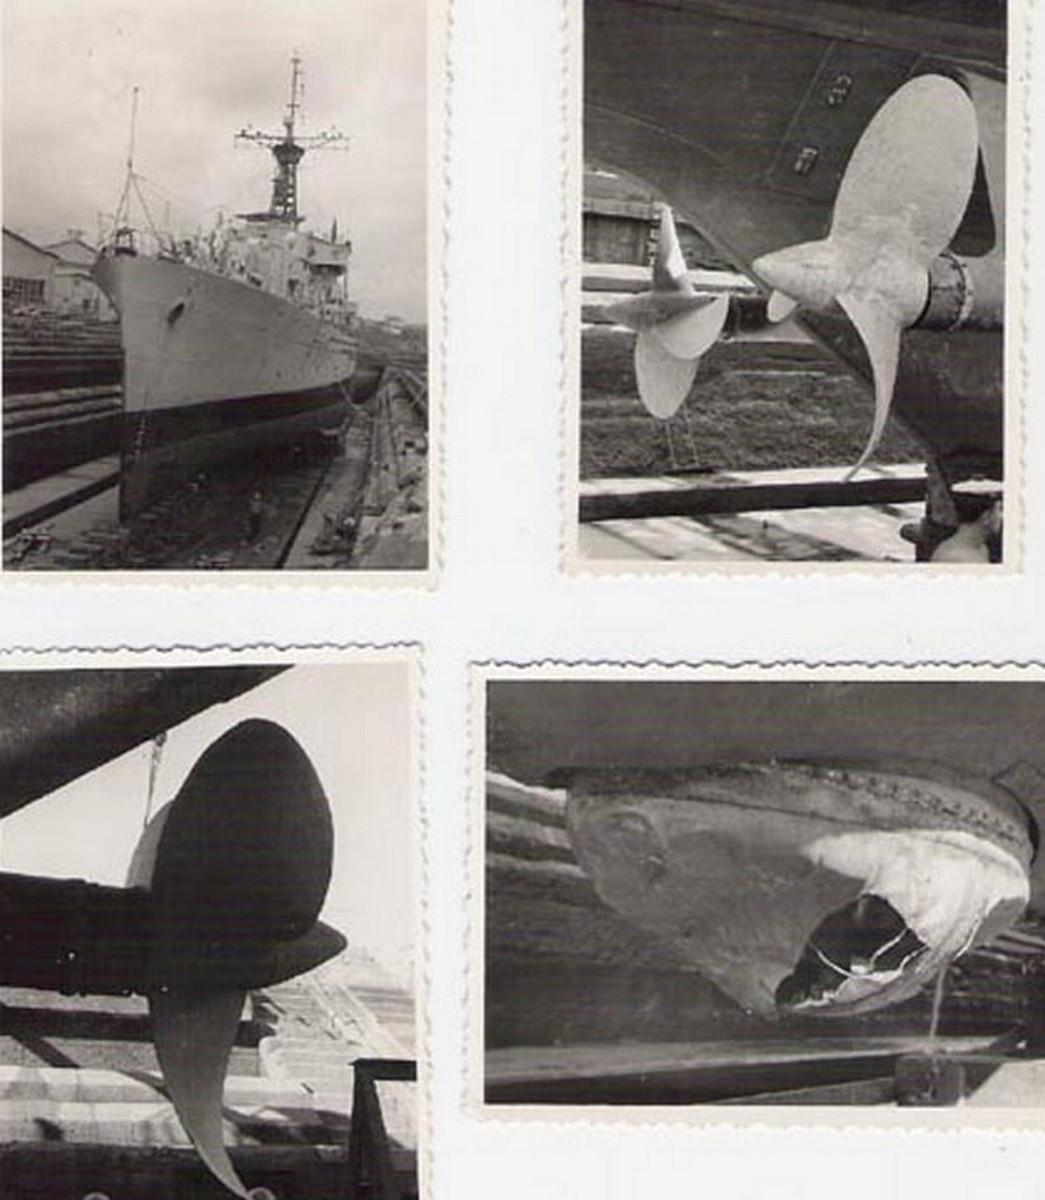 [Les traditions dans la Marine] JOYEUSES FÊTES... A BORD 1232